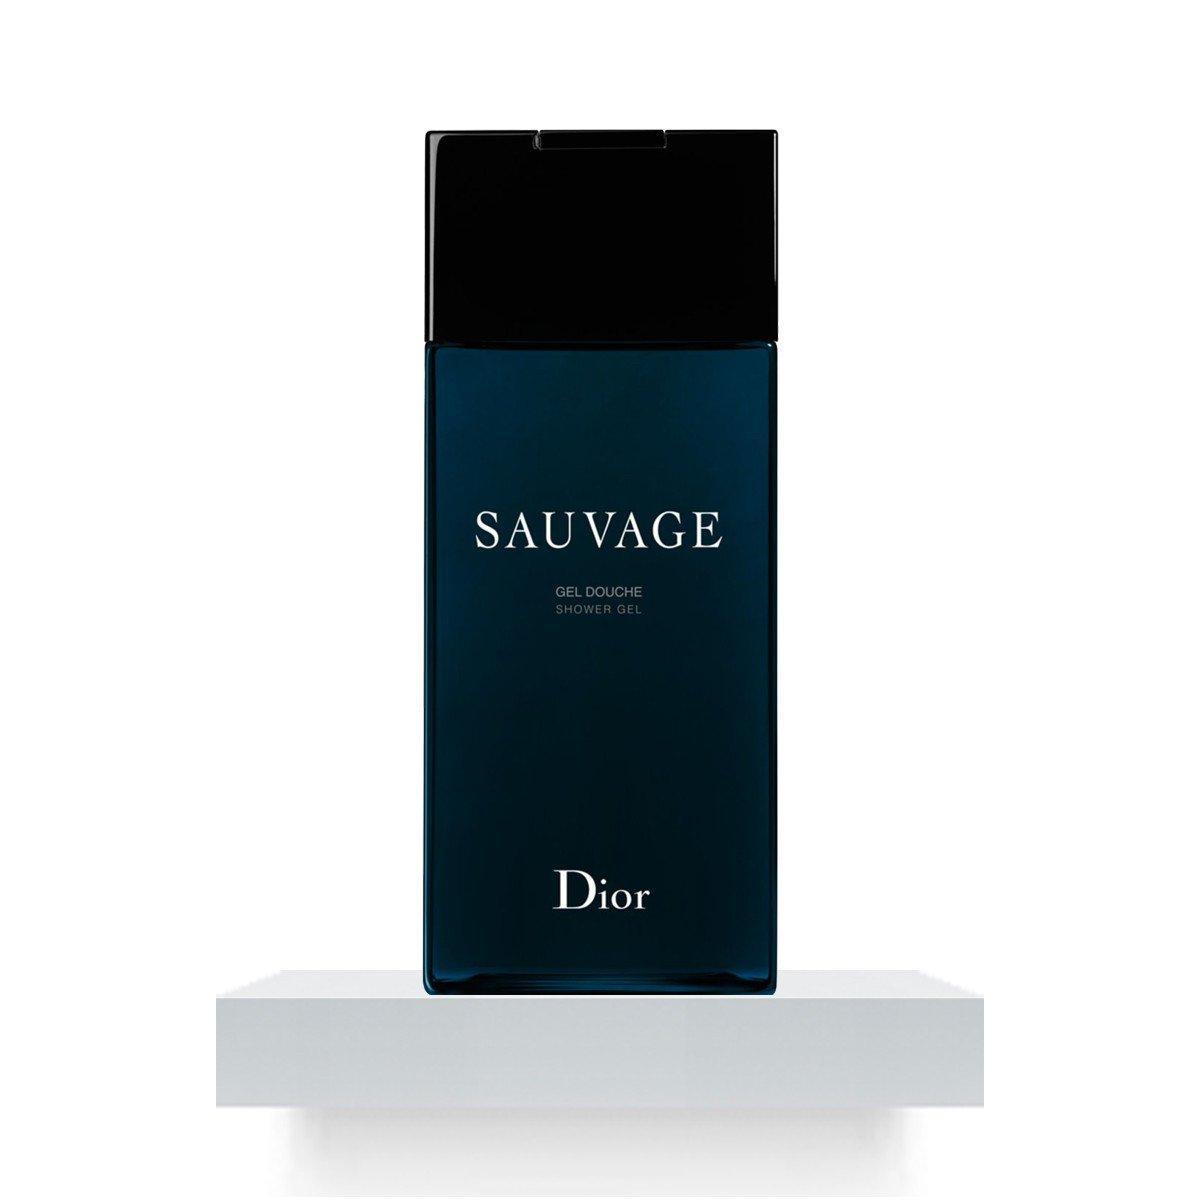 Christian Dior SAUVAGE EDT Eau de Toilette Spray 60ml  2oz Men NEW IN SEALED BOX & 100% Original